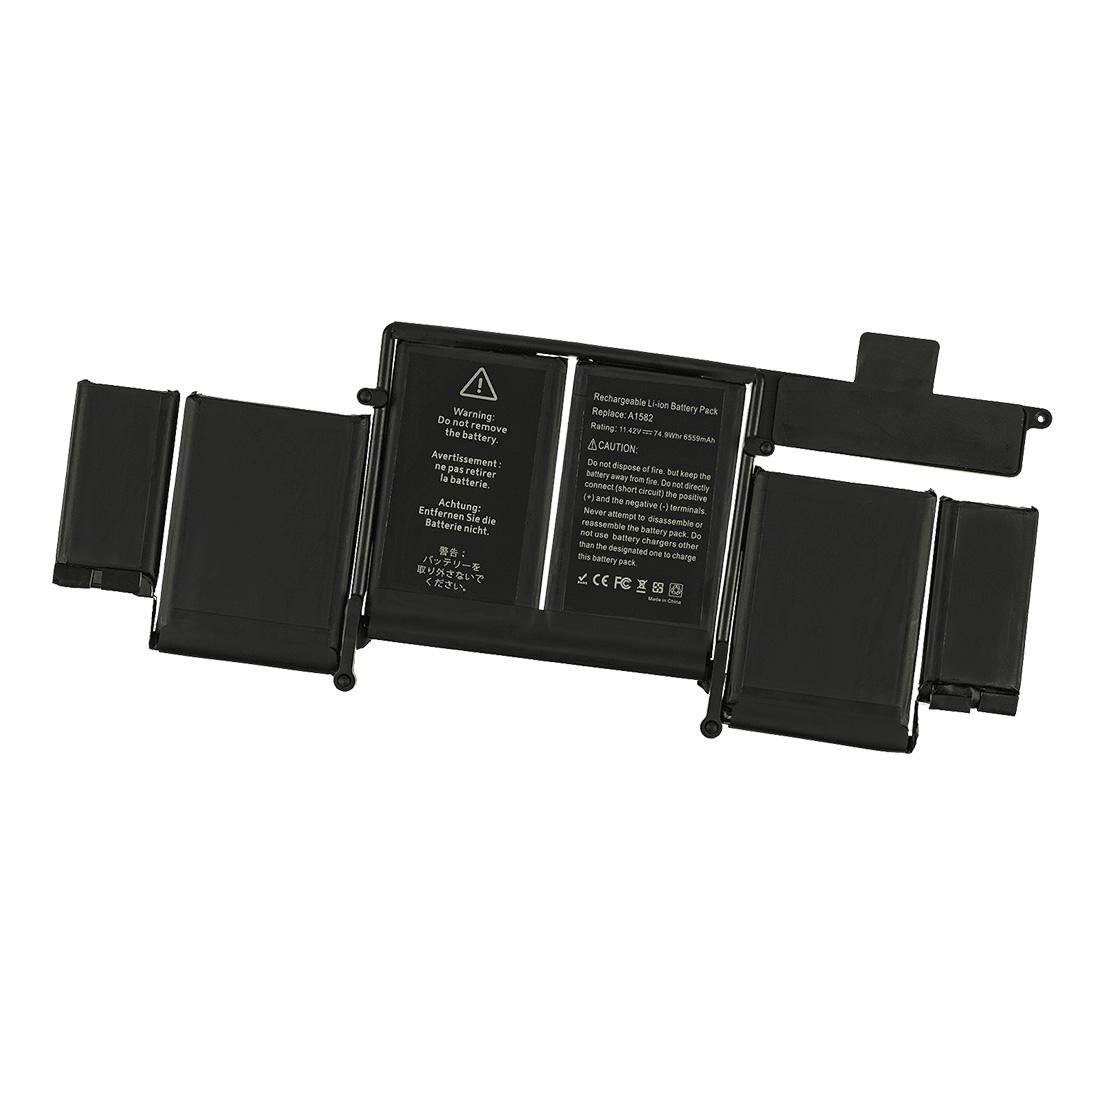 "MacBook Pro Retina 13"" 2015 / A1502 A1582 Battery (OEM ..."